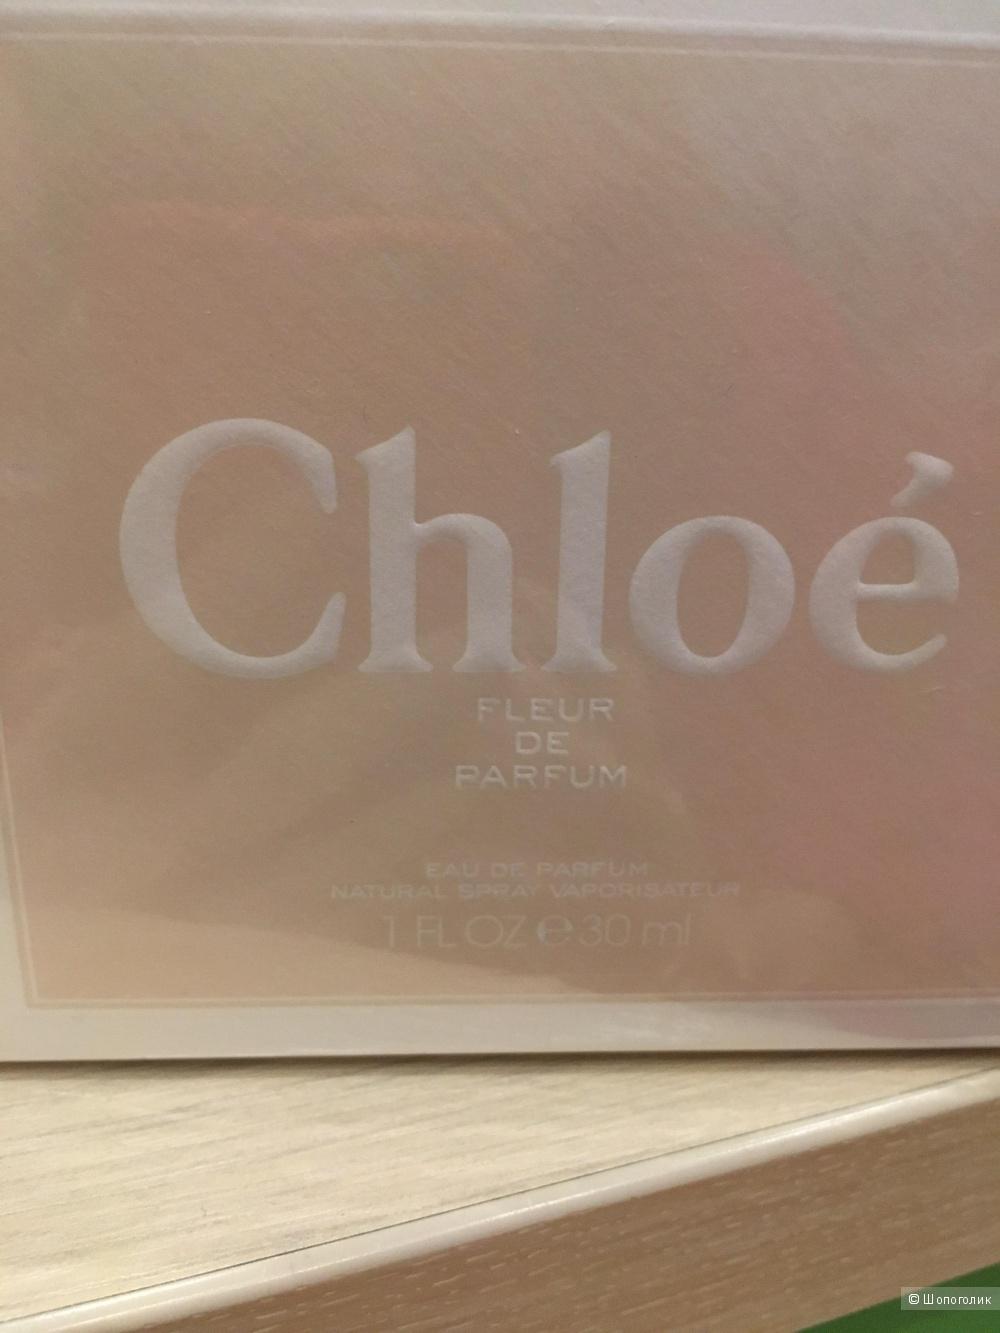 Chloe Fleur De Parfum 30ml